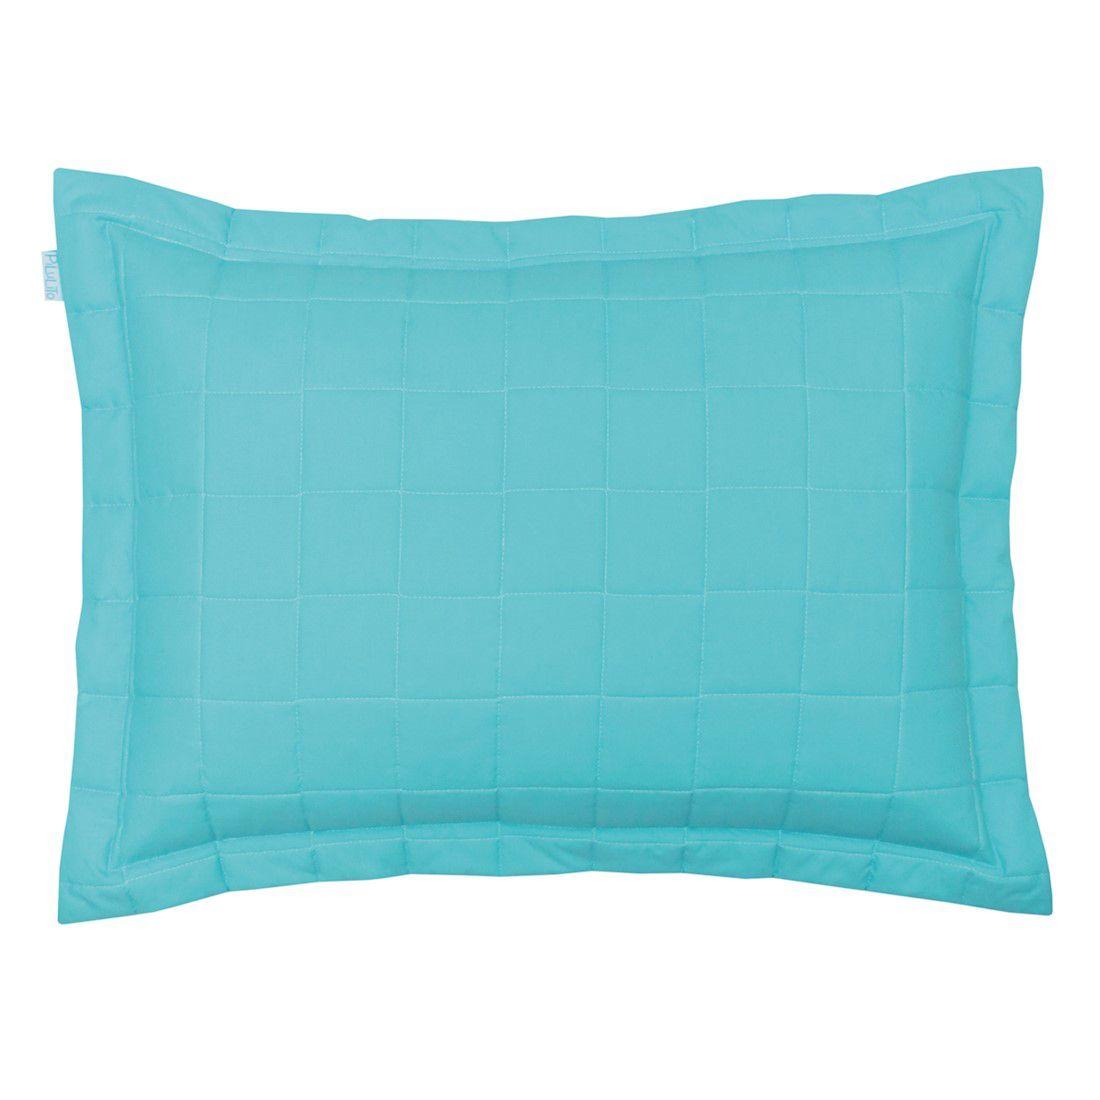 Porta travesseiro percal 200 fios cubos turquesa